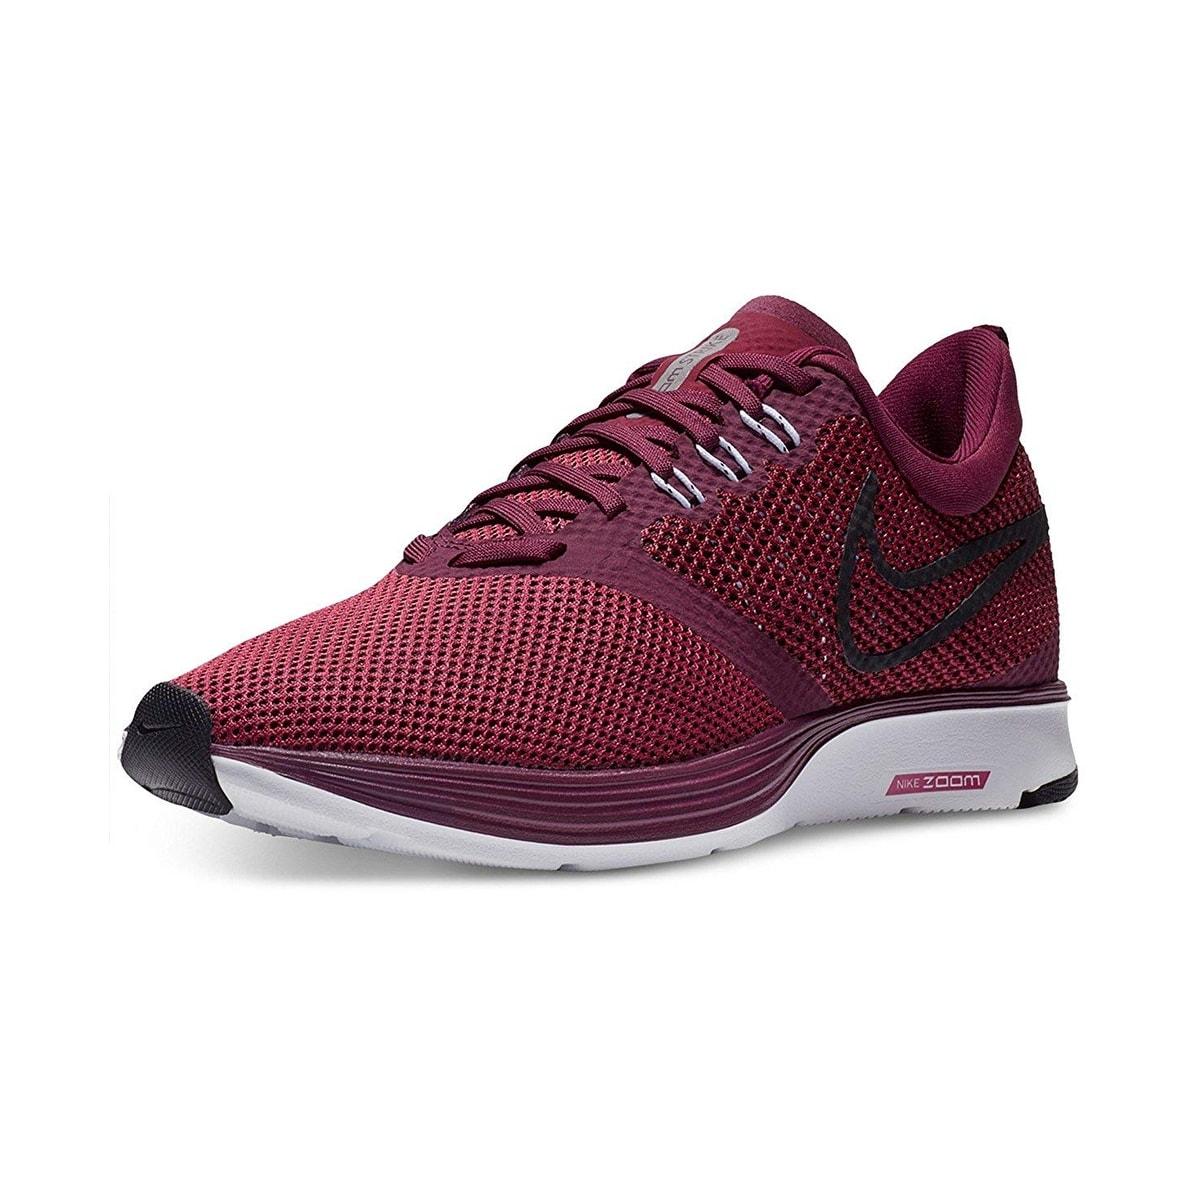 ec7ae28a29ff3 Nike Womens Wmns Zoom Strike Bordeaux/Black Rush Maroon Wht Size 9